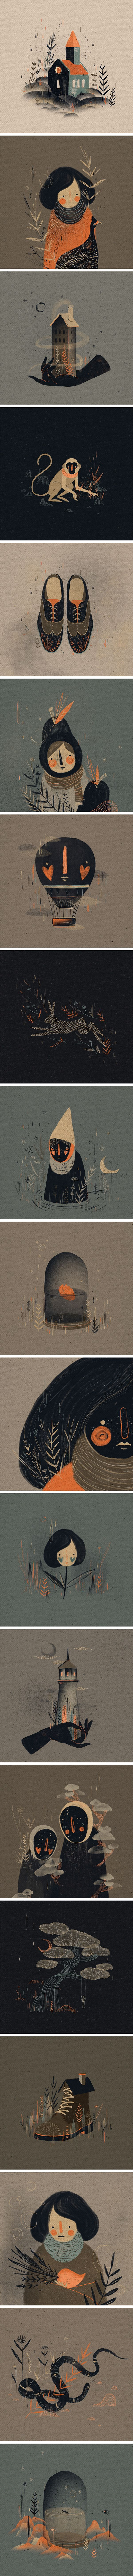 casinha. Illustration, warm colours, sweet, cute, pretty, Orange, Brown, black, blue